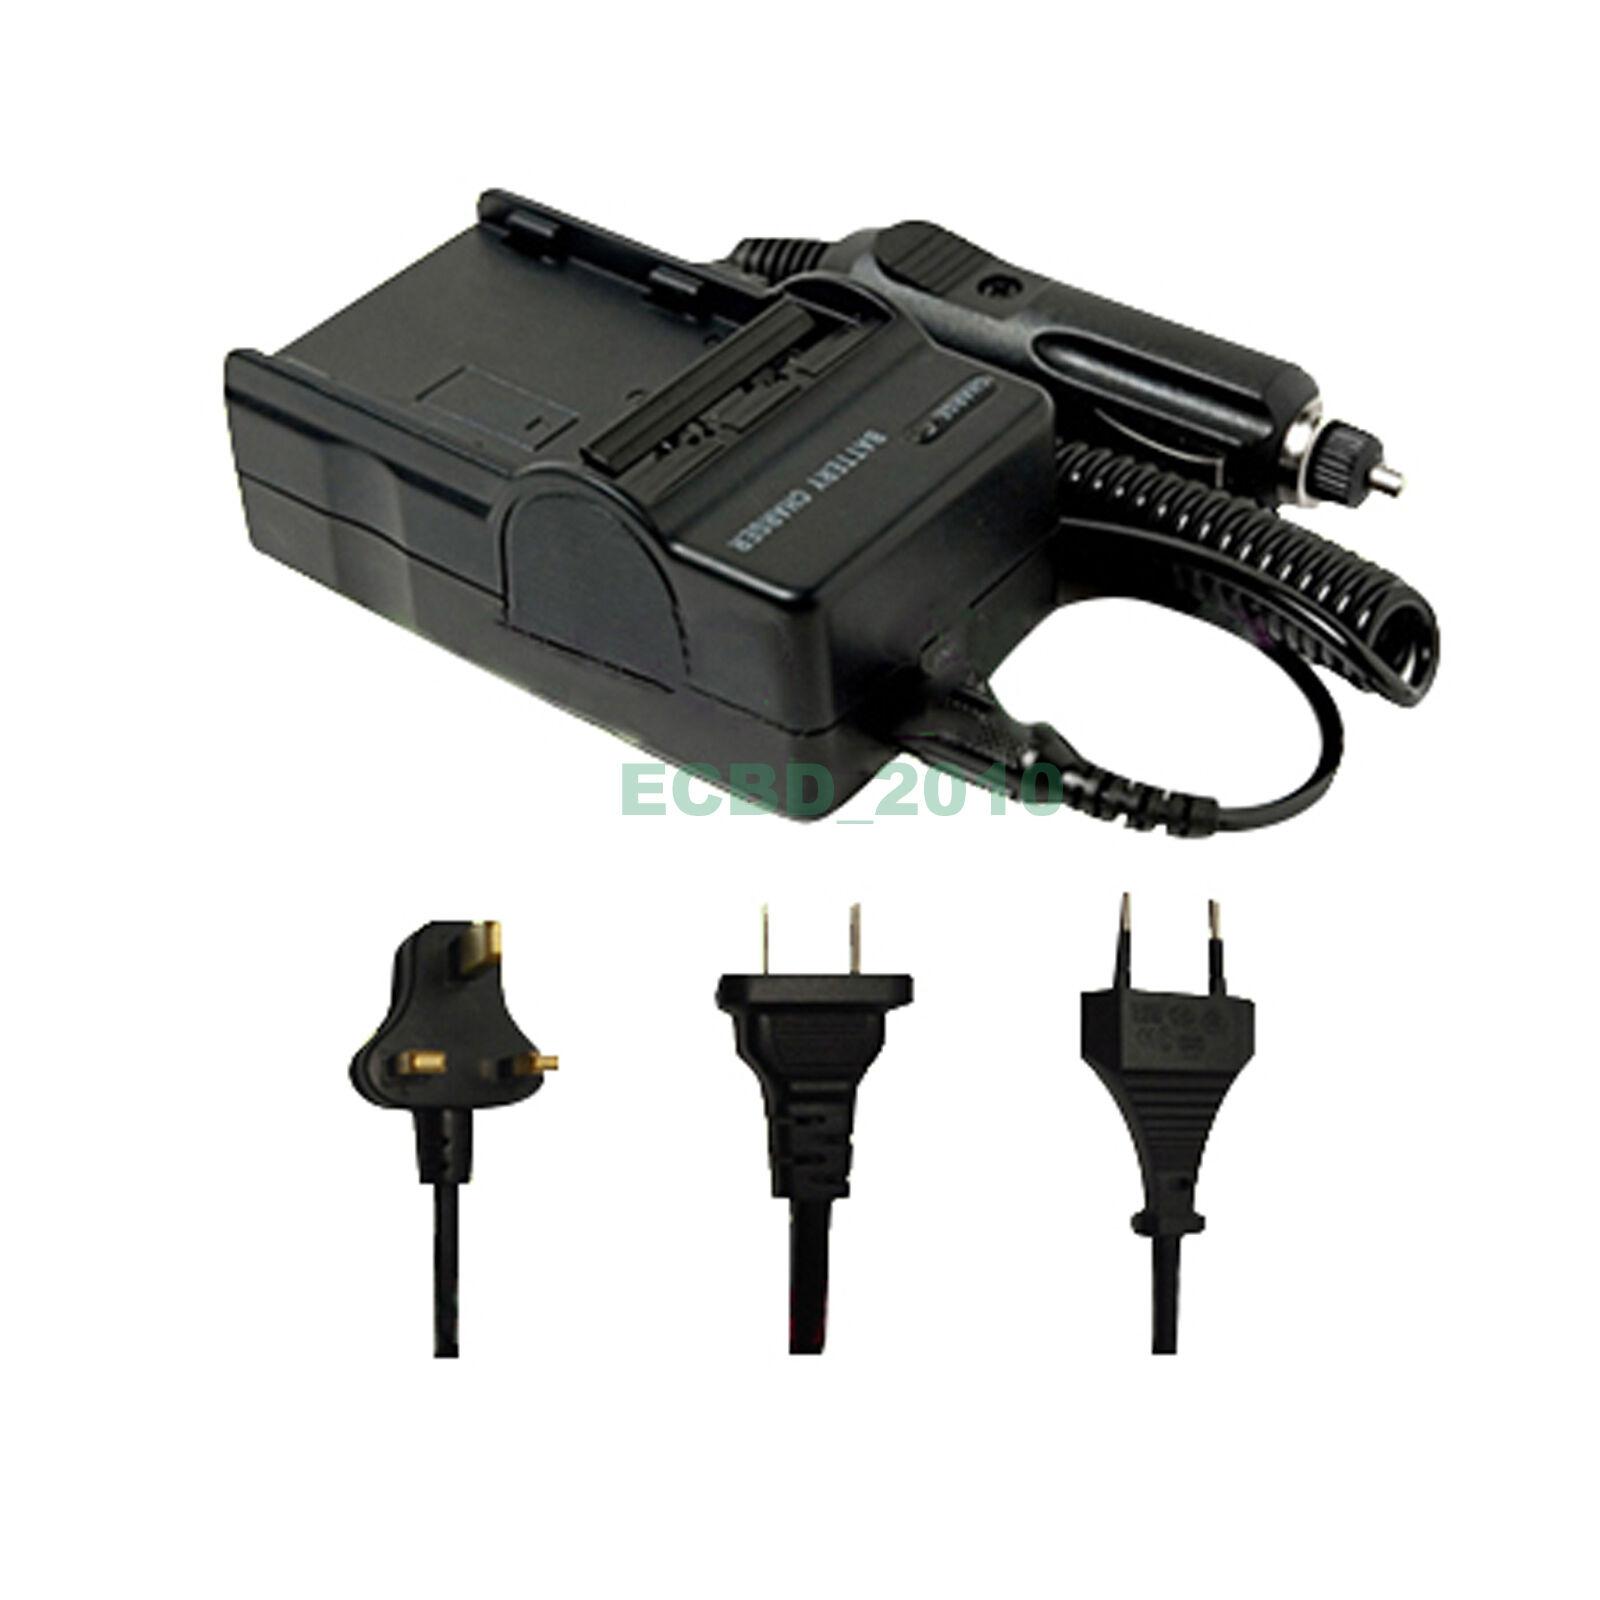 Battery Charger for PANASONIC SDR-H40 SDR-H60 SDR-H80 LSSB0016 PVGS90P PVGS90